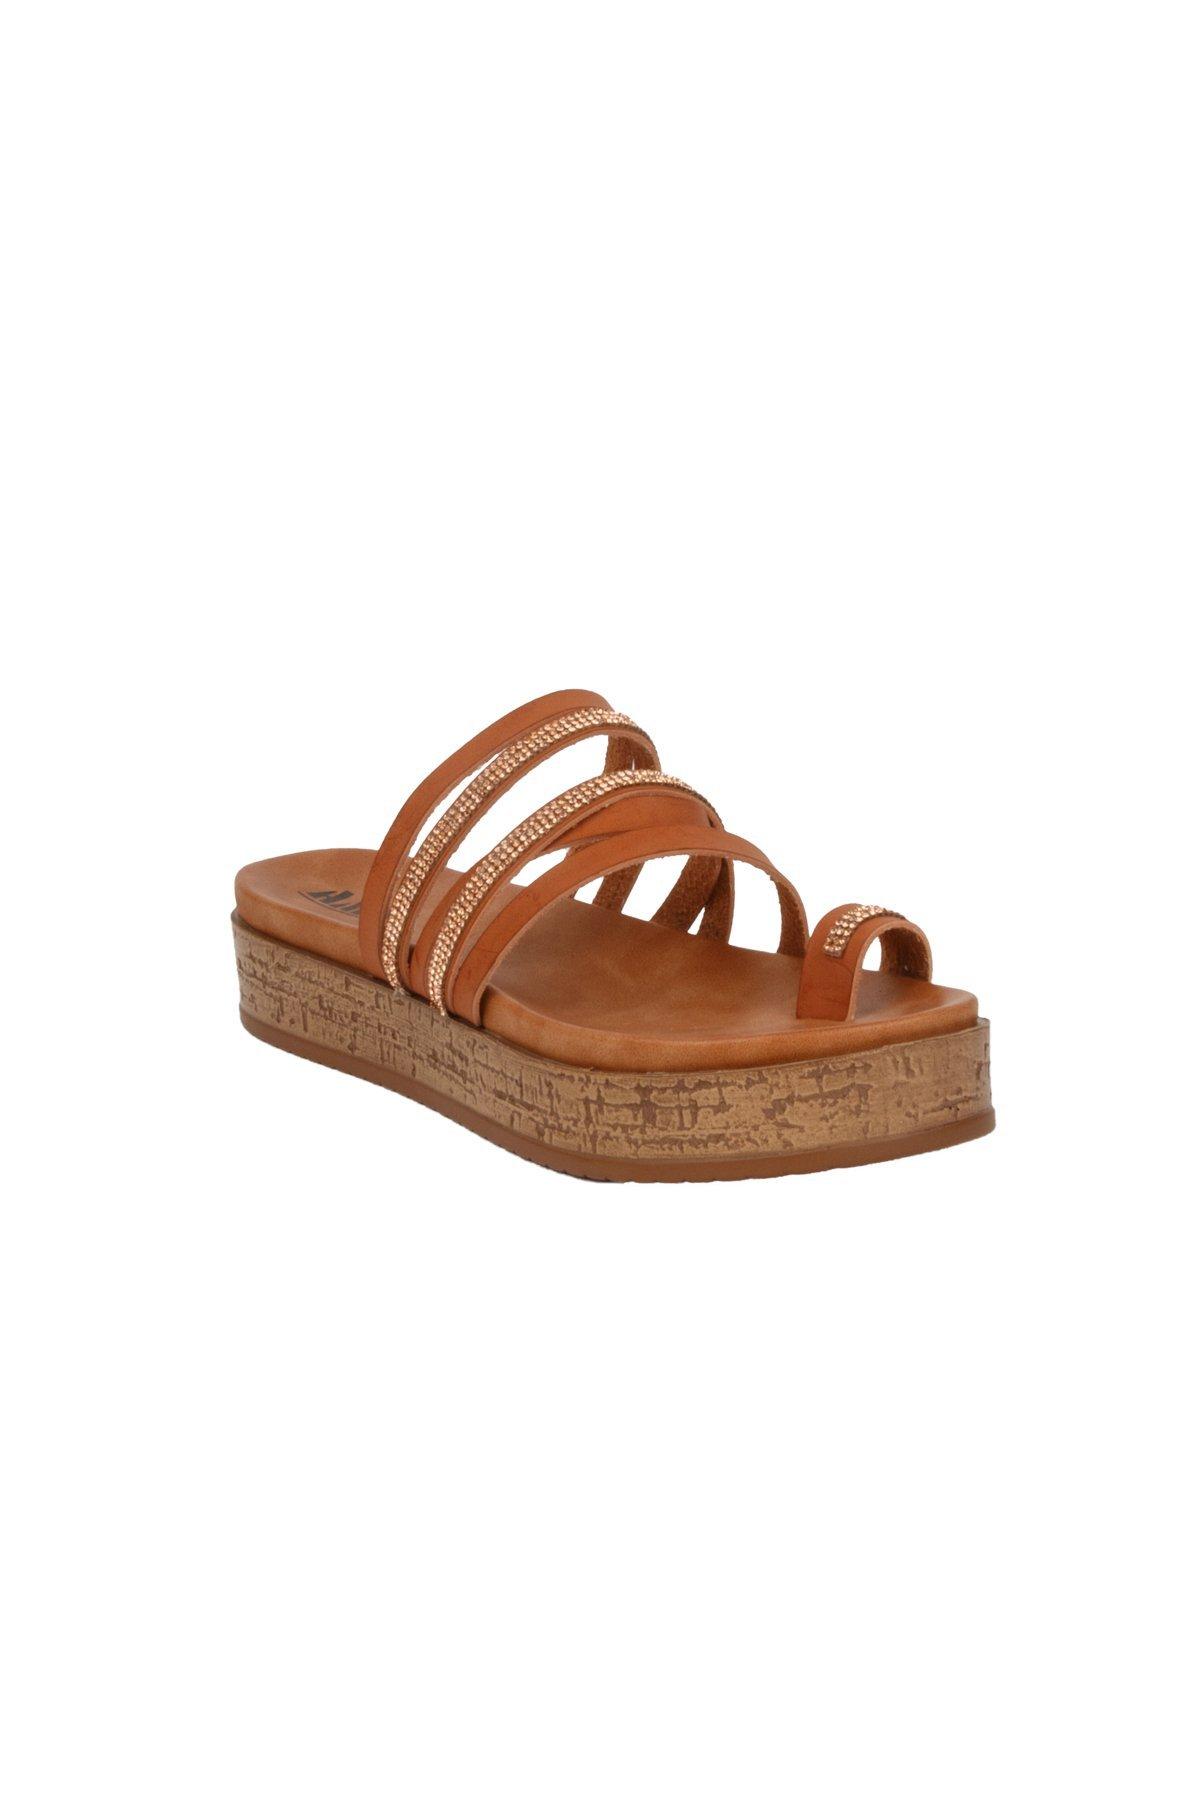 Hadari Women's Platform Slides Summer Flip Flop Beach Toe Ring Sandal